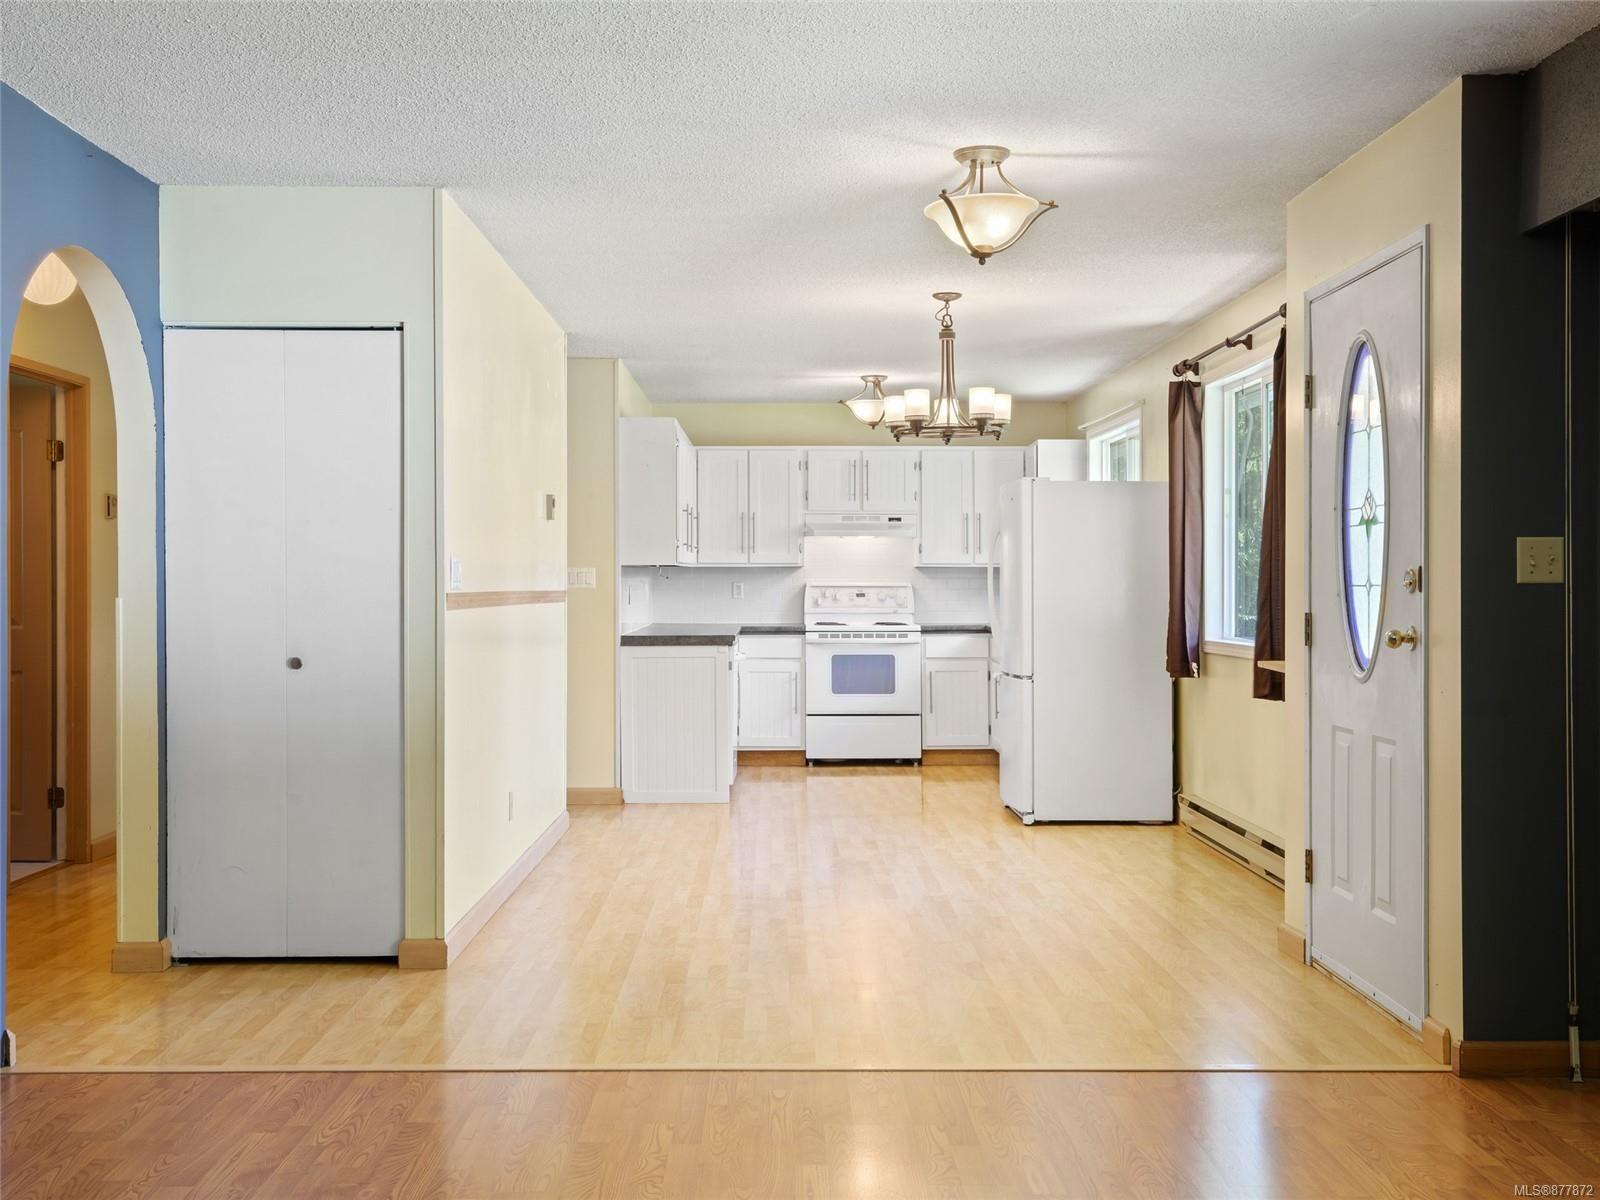 Photo 8: Photos: 7865 Wardrop Rd in : PA Port Alberni House for sale (Port Alberni)  : MLS®# 877872